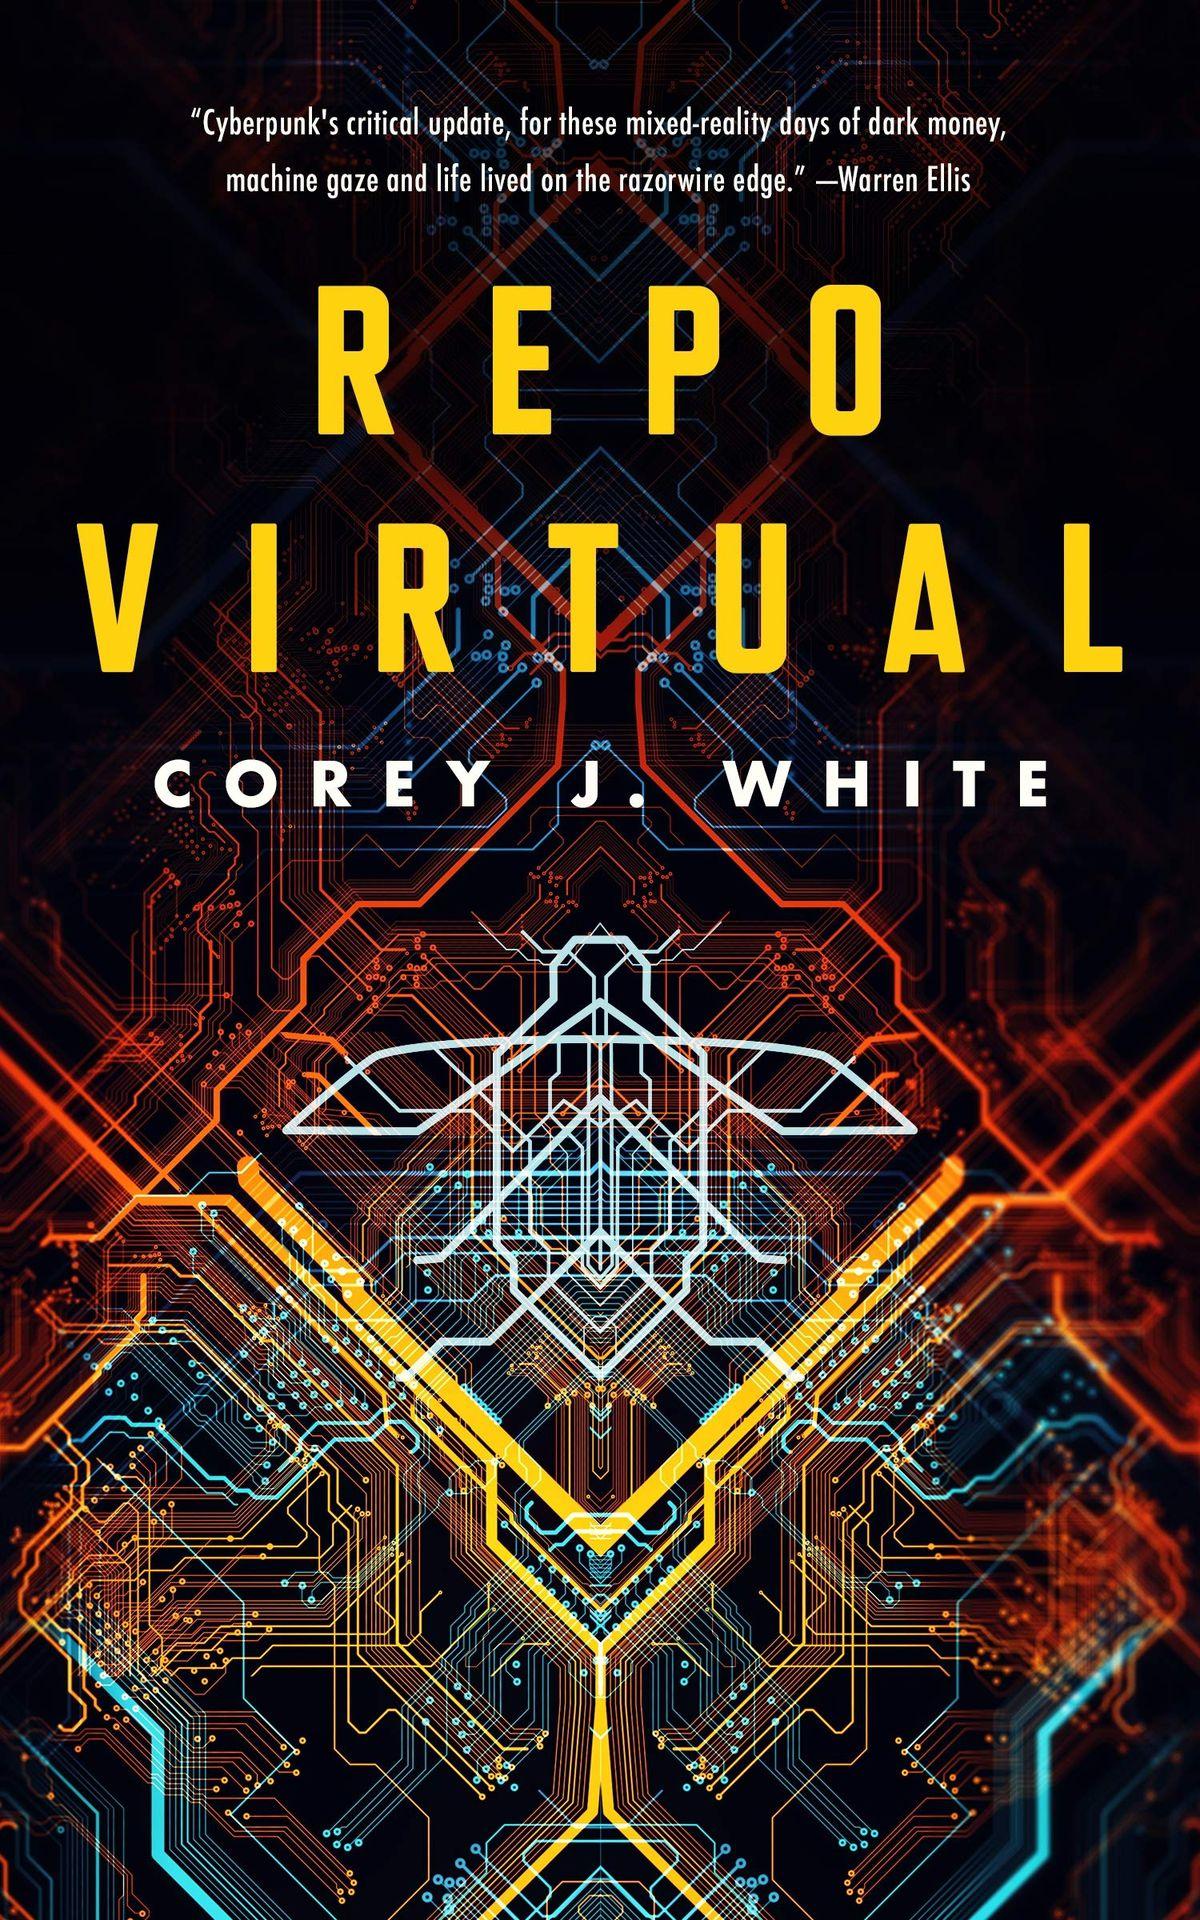 circuits wind around the cover of repo virtual cover